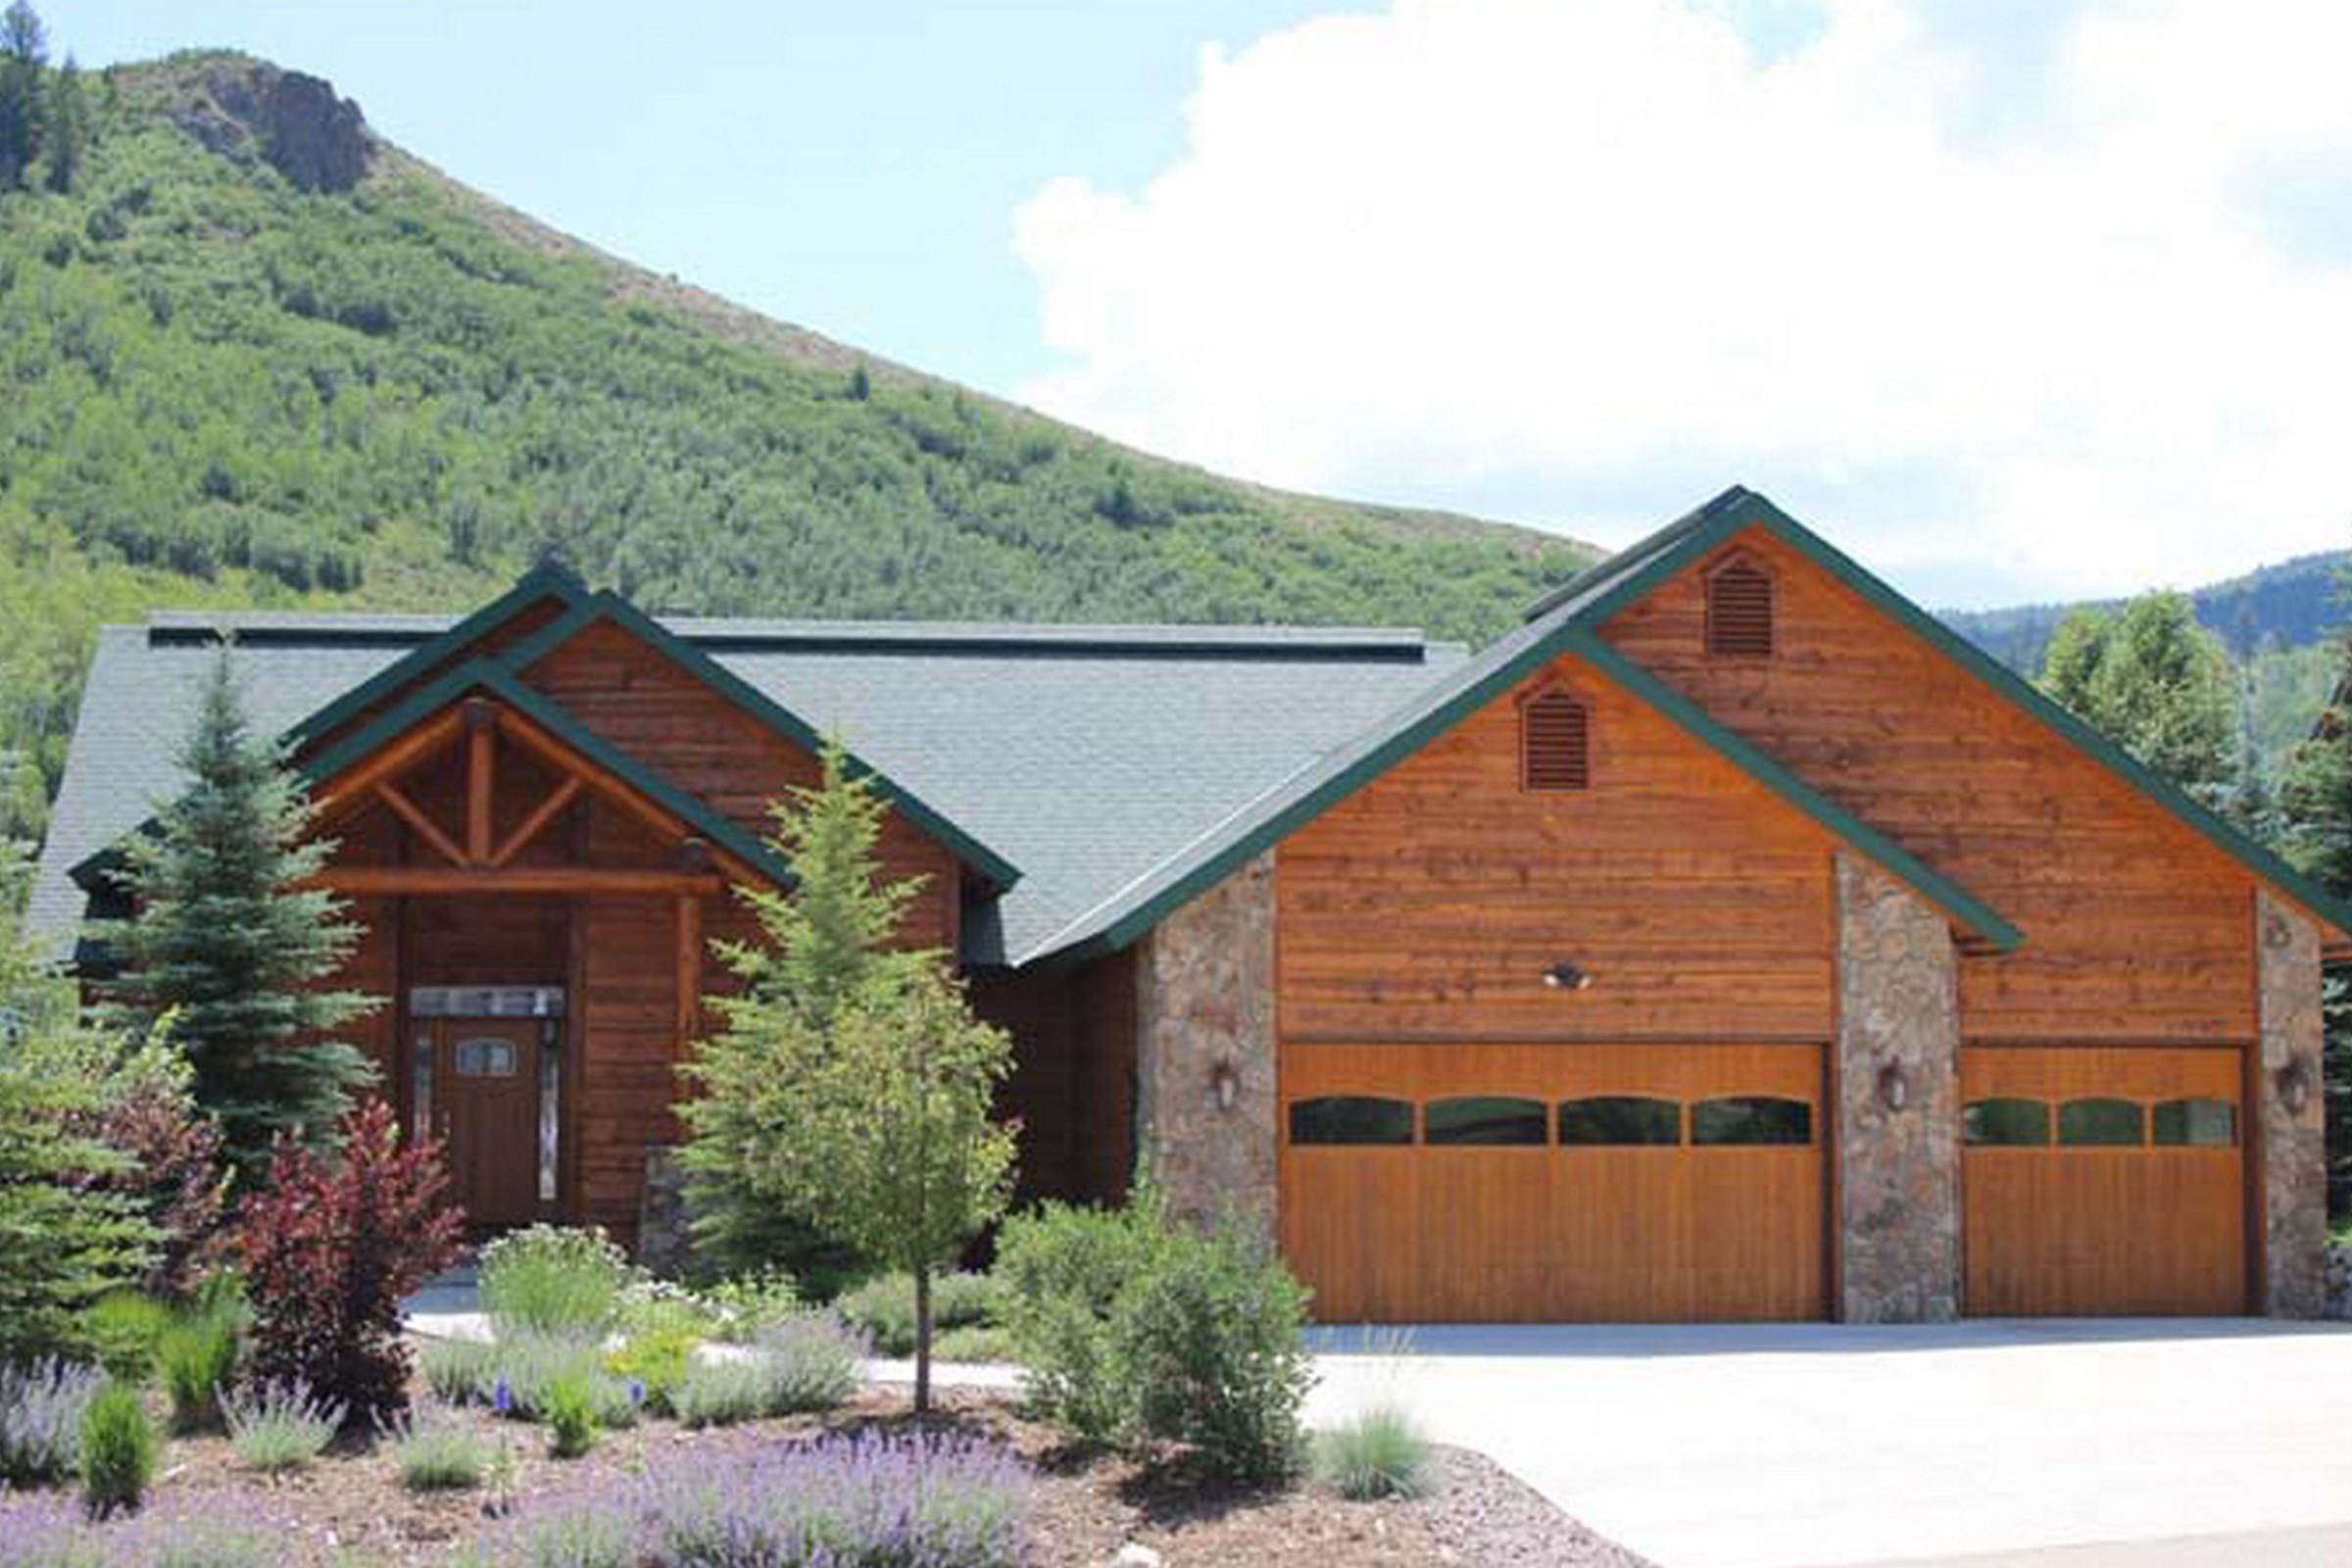 30370 Coyote Run Ct, Oak Creek, CO 80467